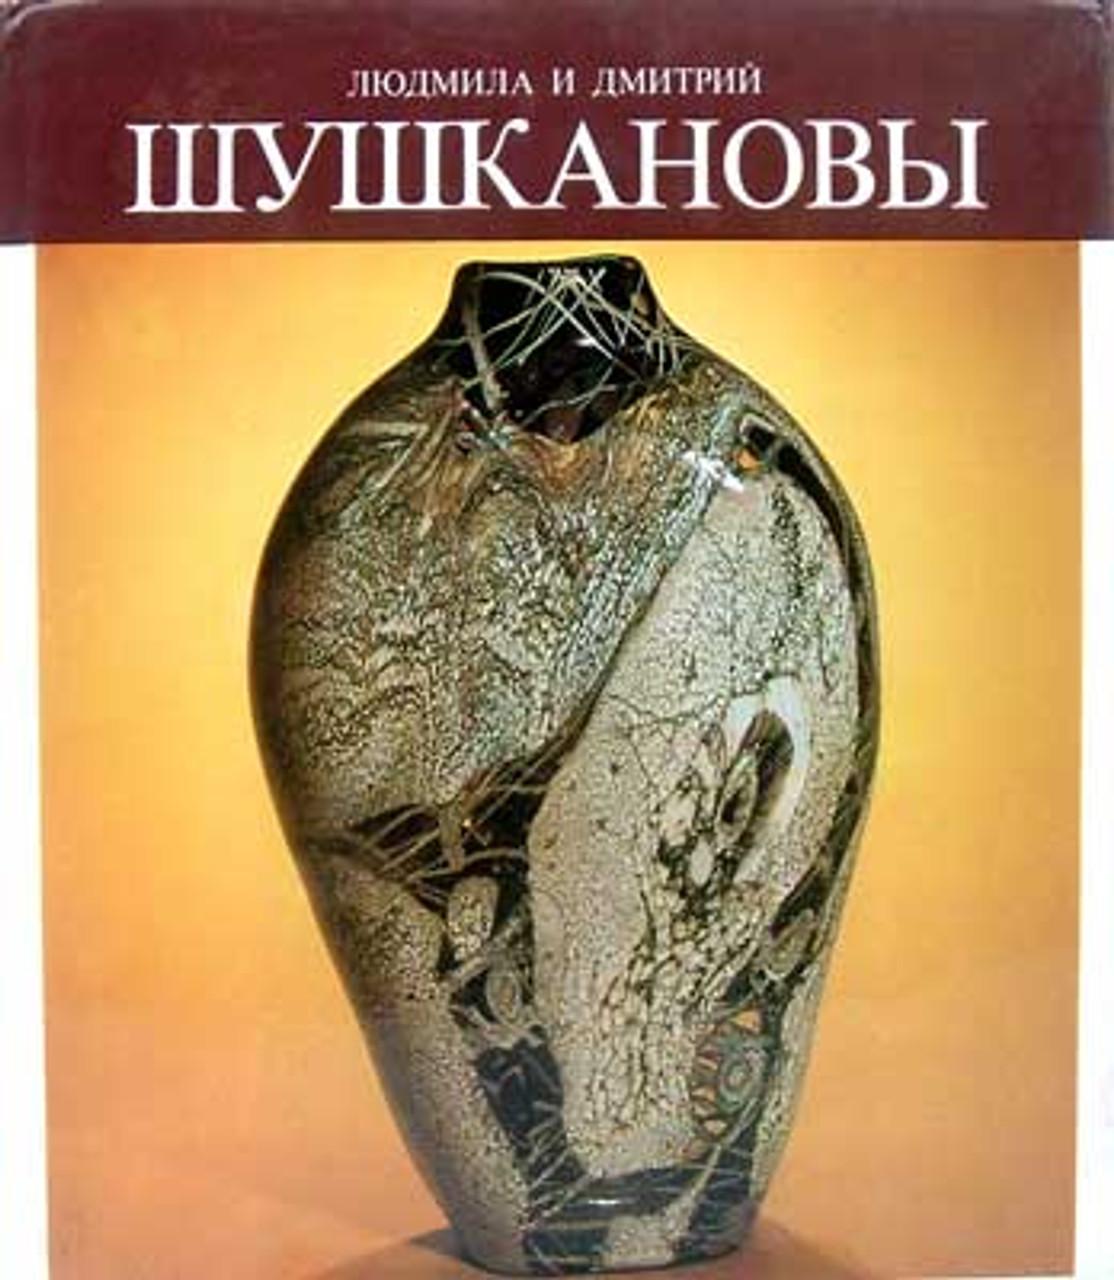 Liudmila and Dmitry Shushkanov: An Image of the Mode of Life